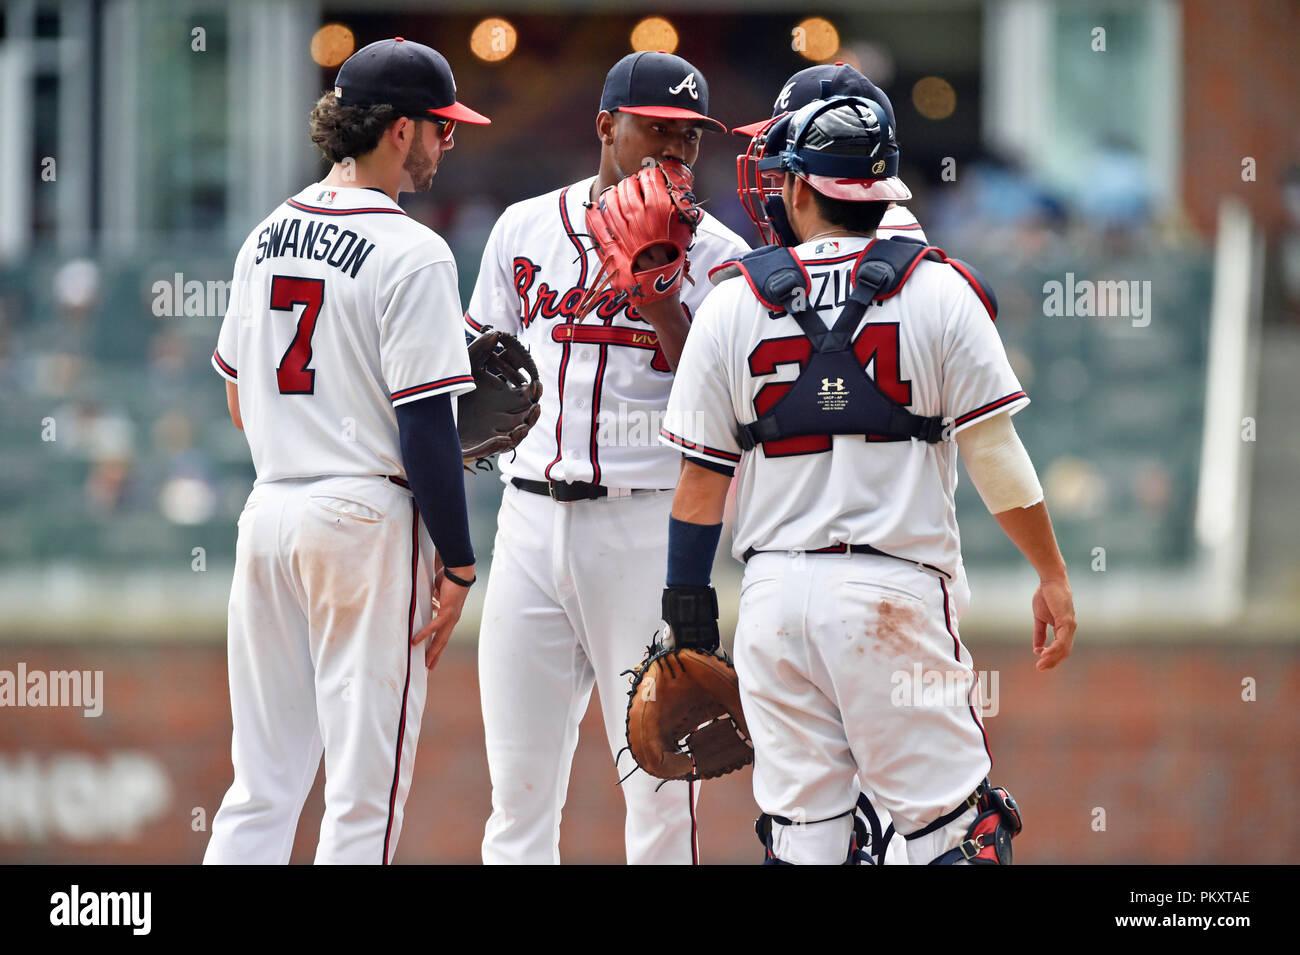 check out 0b53f cb768 Atlanta, GA, USA. 15th Sep, 2018. Atlanta Braves pitcher ...